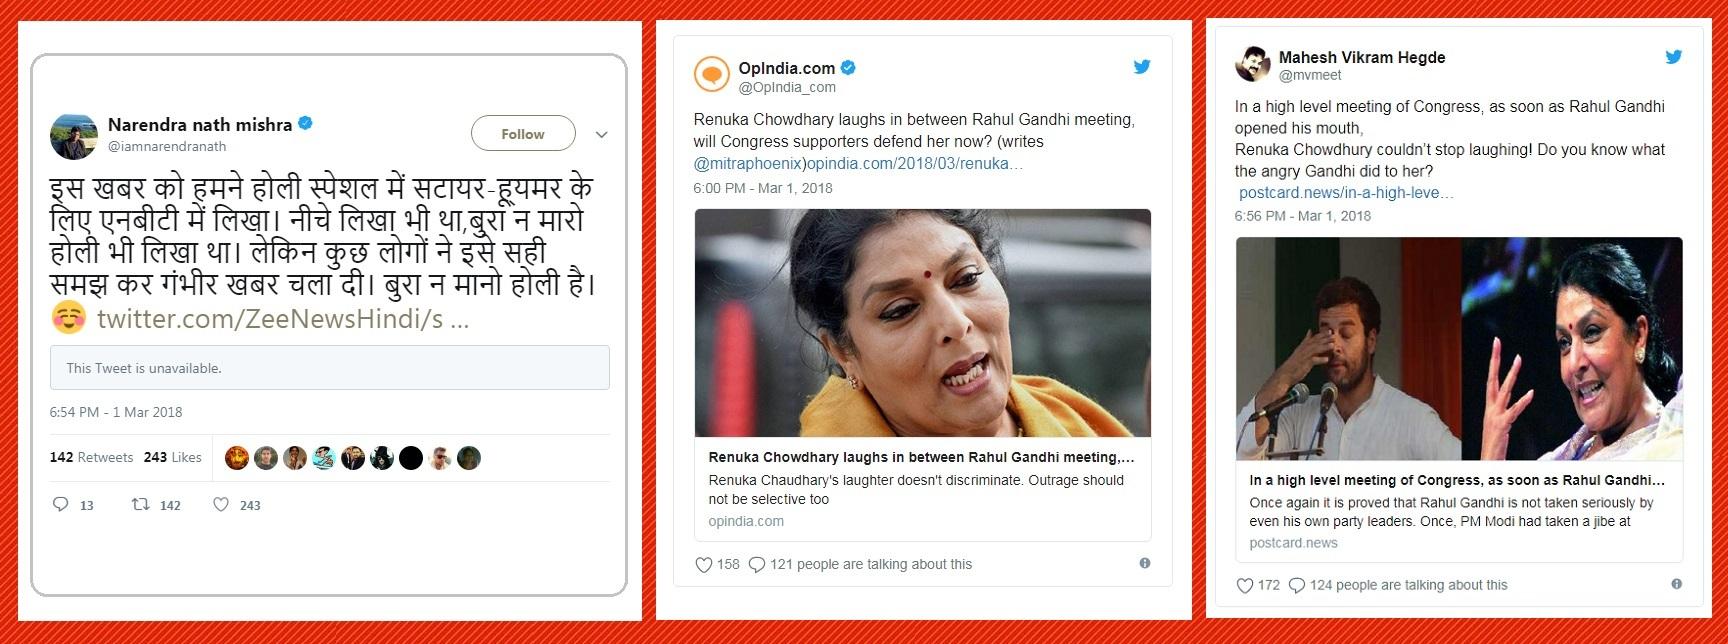 OpIndia_FakeNews